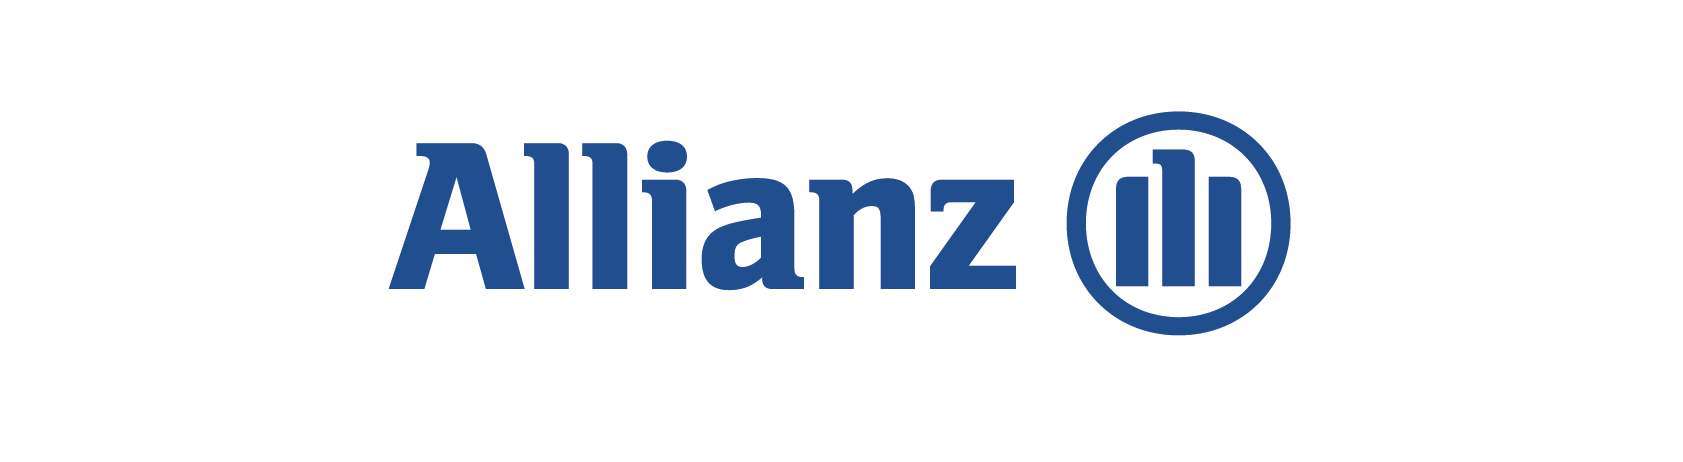 10 - allianz